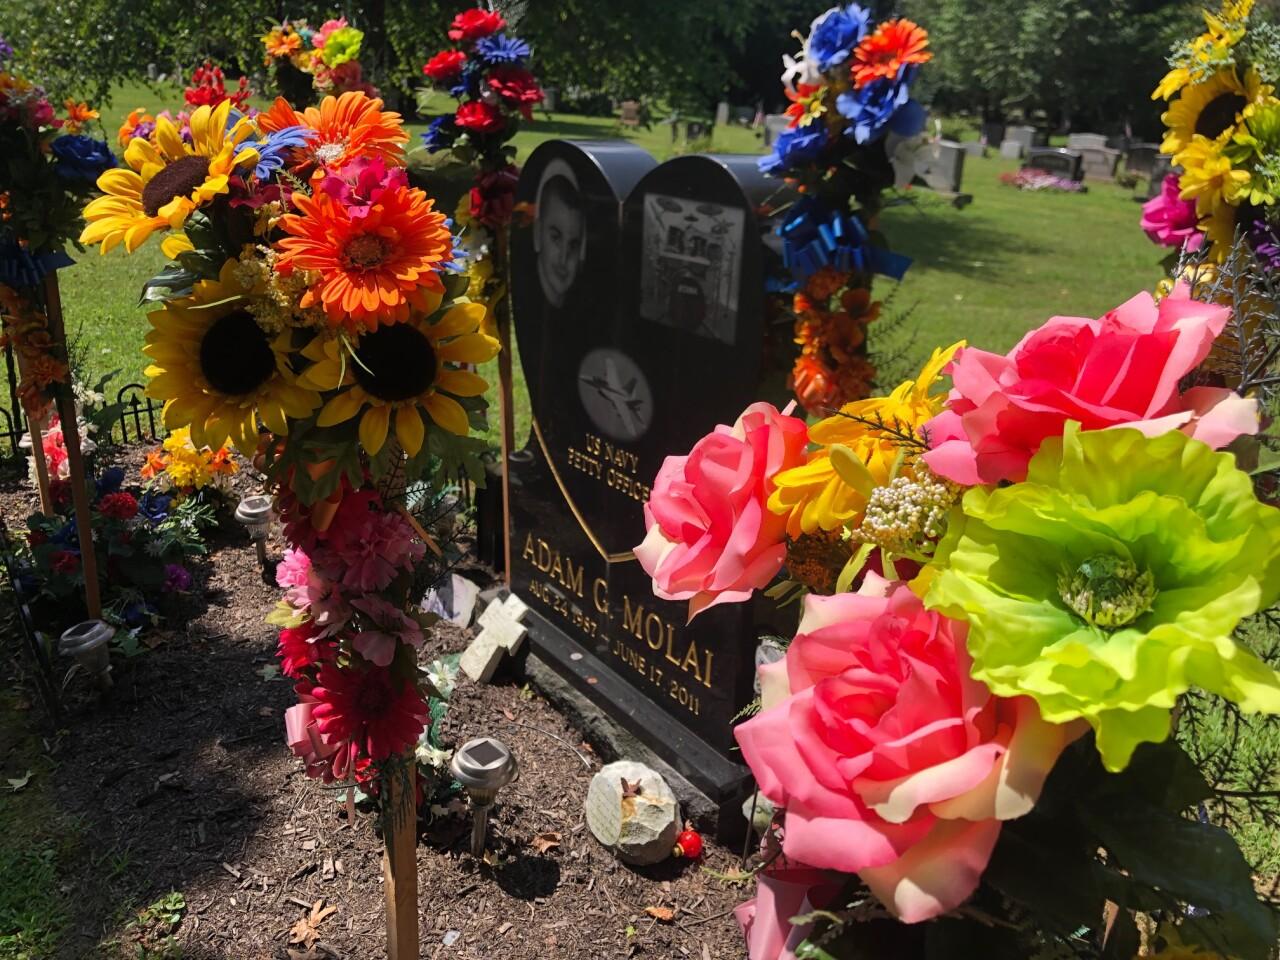 kent cemetery spat 5